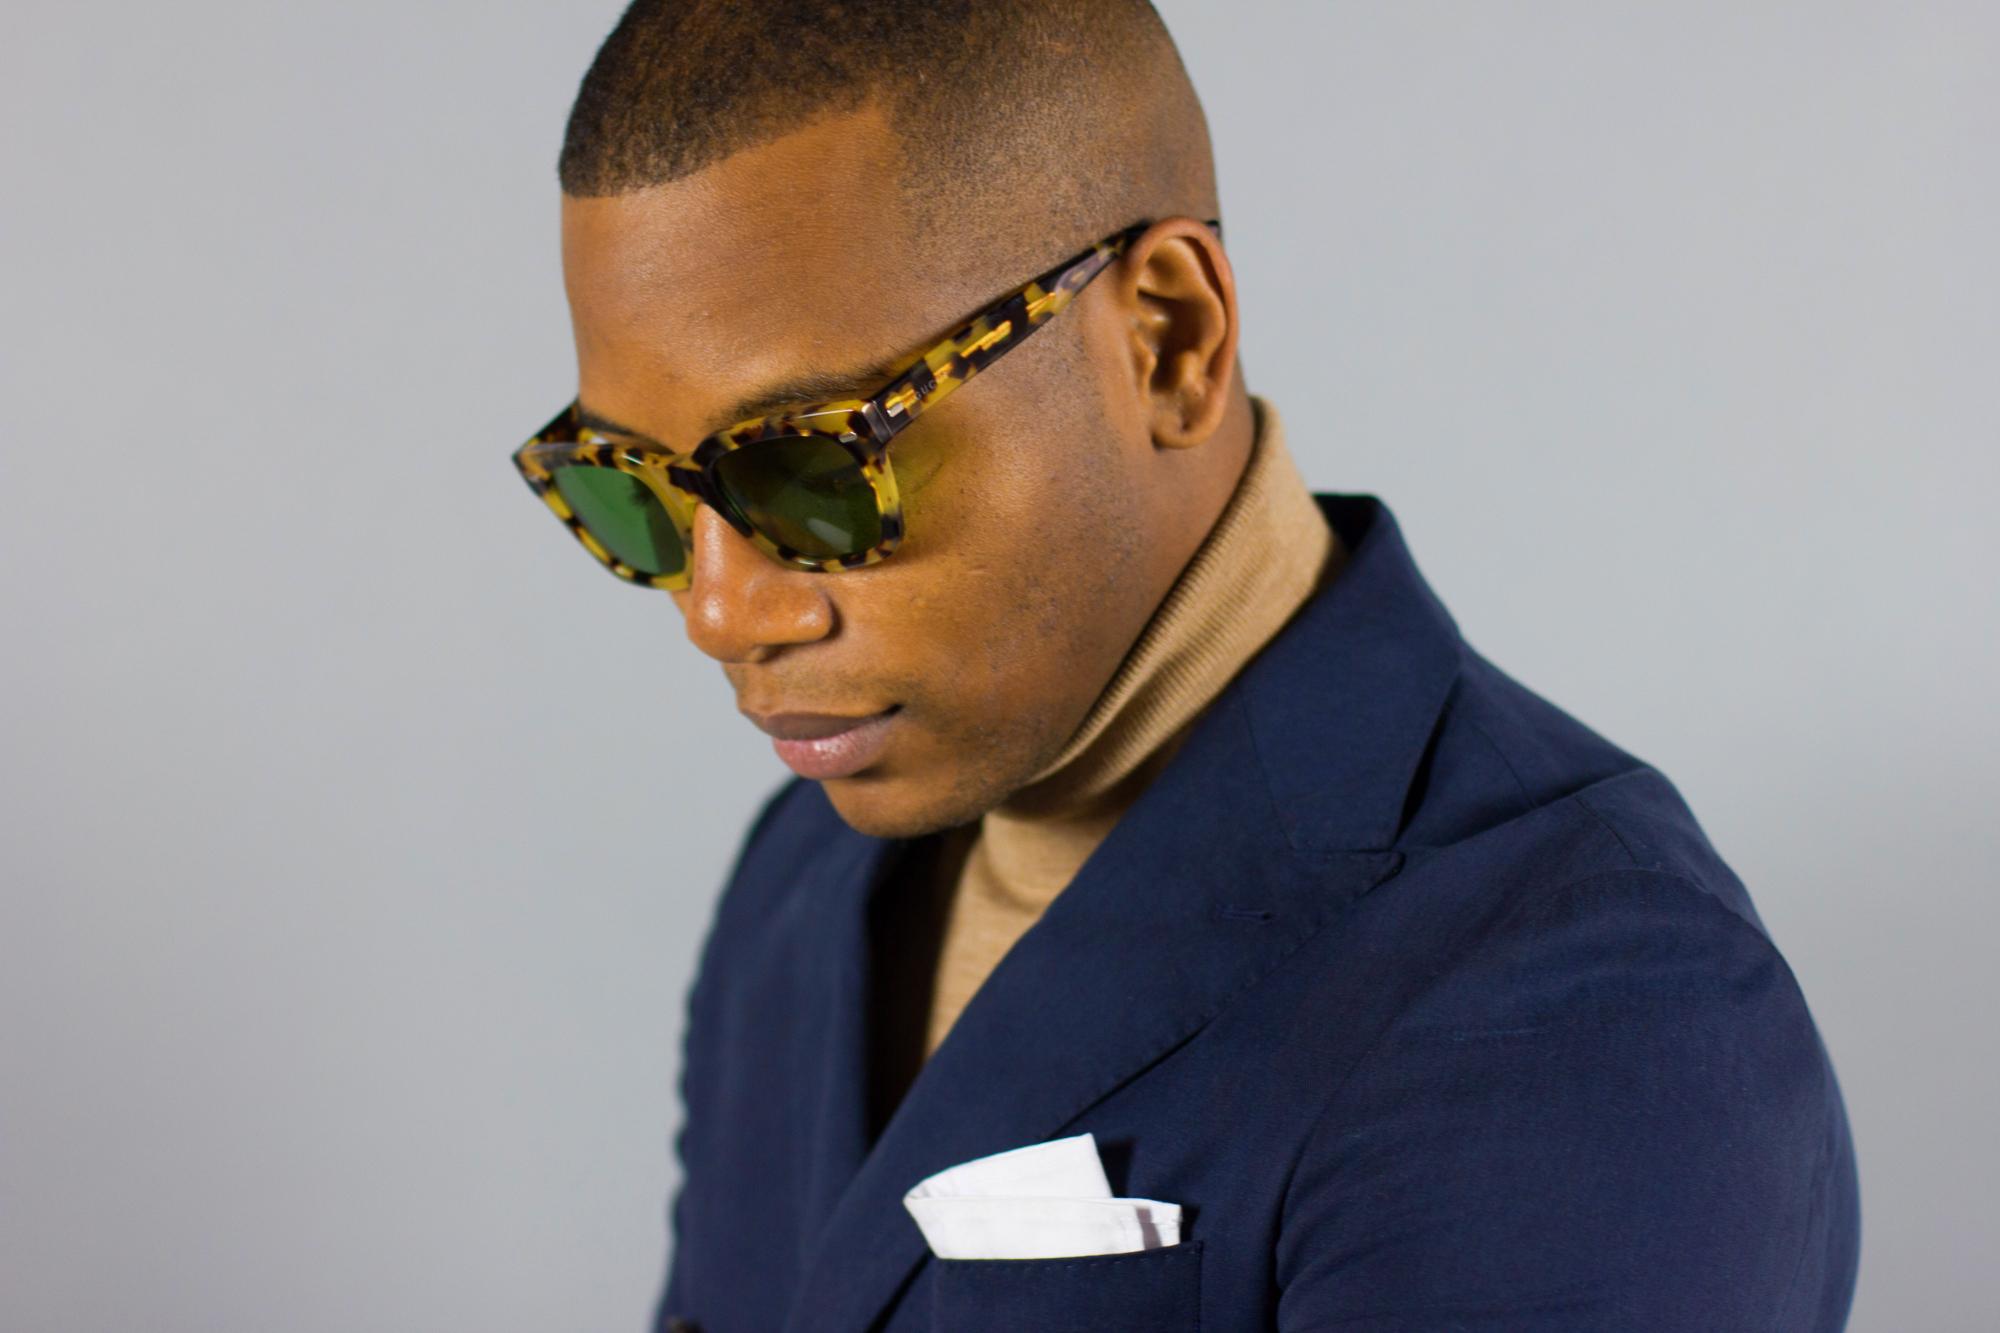 's Style Pro Sunglasses w: Smart Buy Sunglasses 70 sunglass swagger